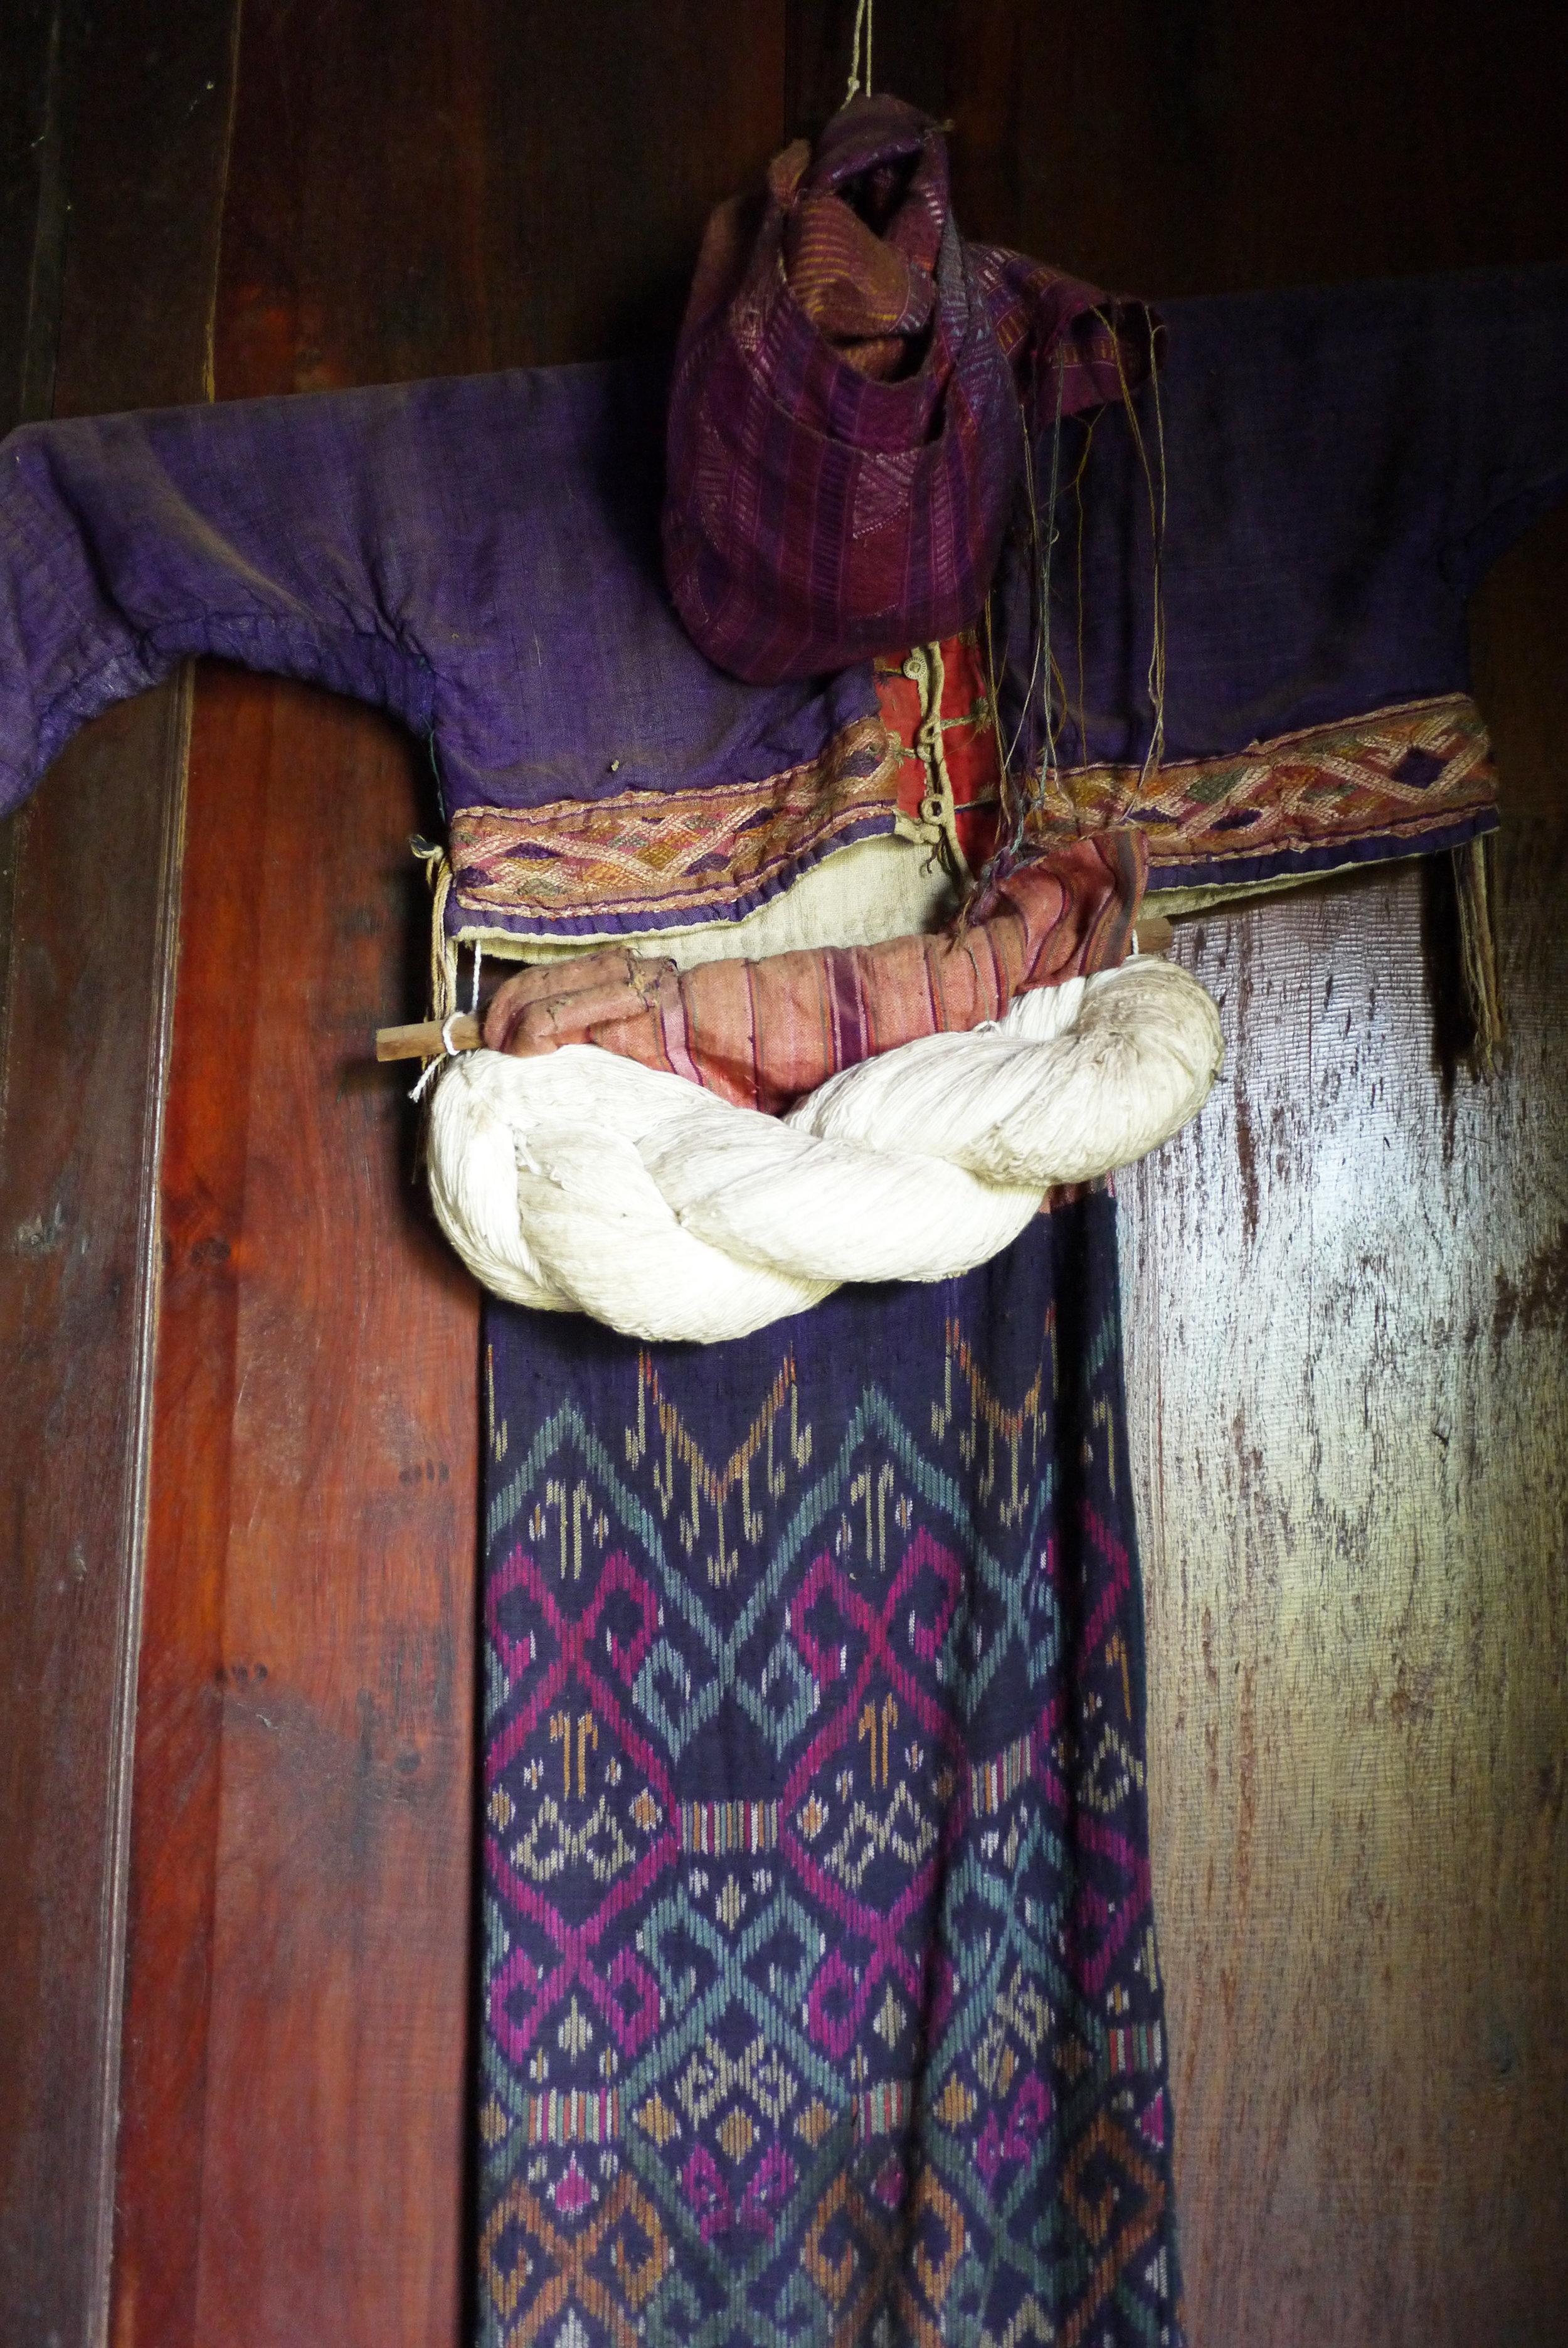 Antique 'Tai Moei' costume on display